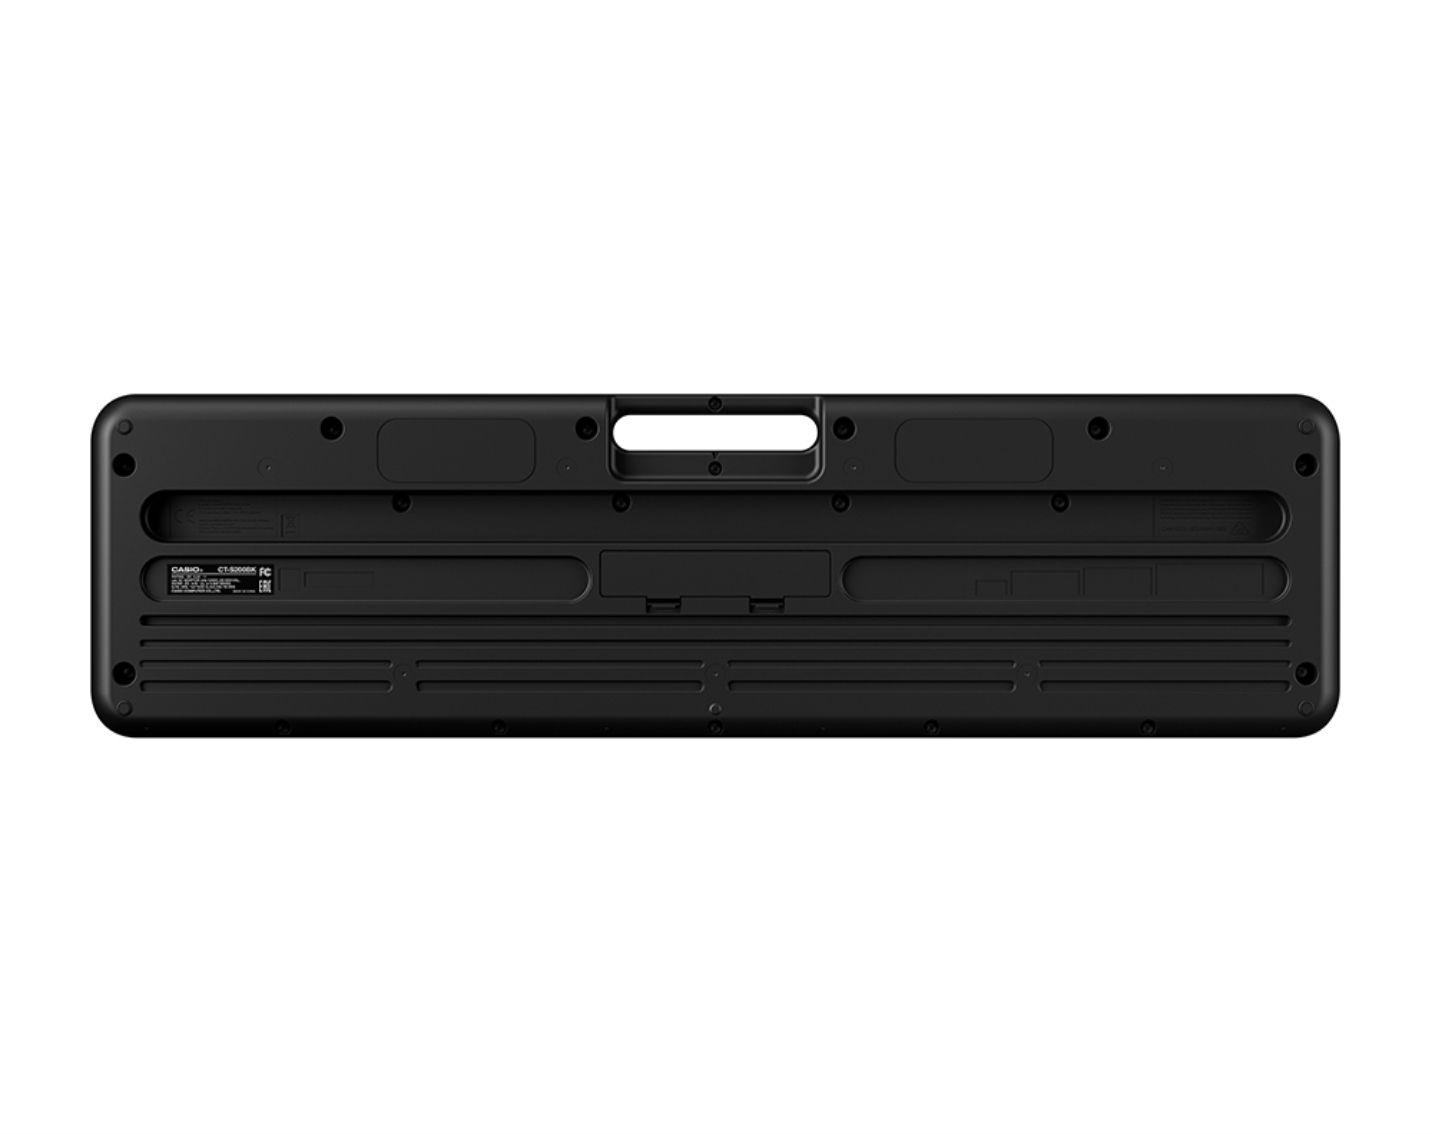 Teclado Casio CT-S200 Preto Lançamento 2020